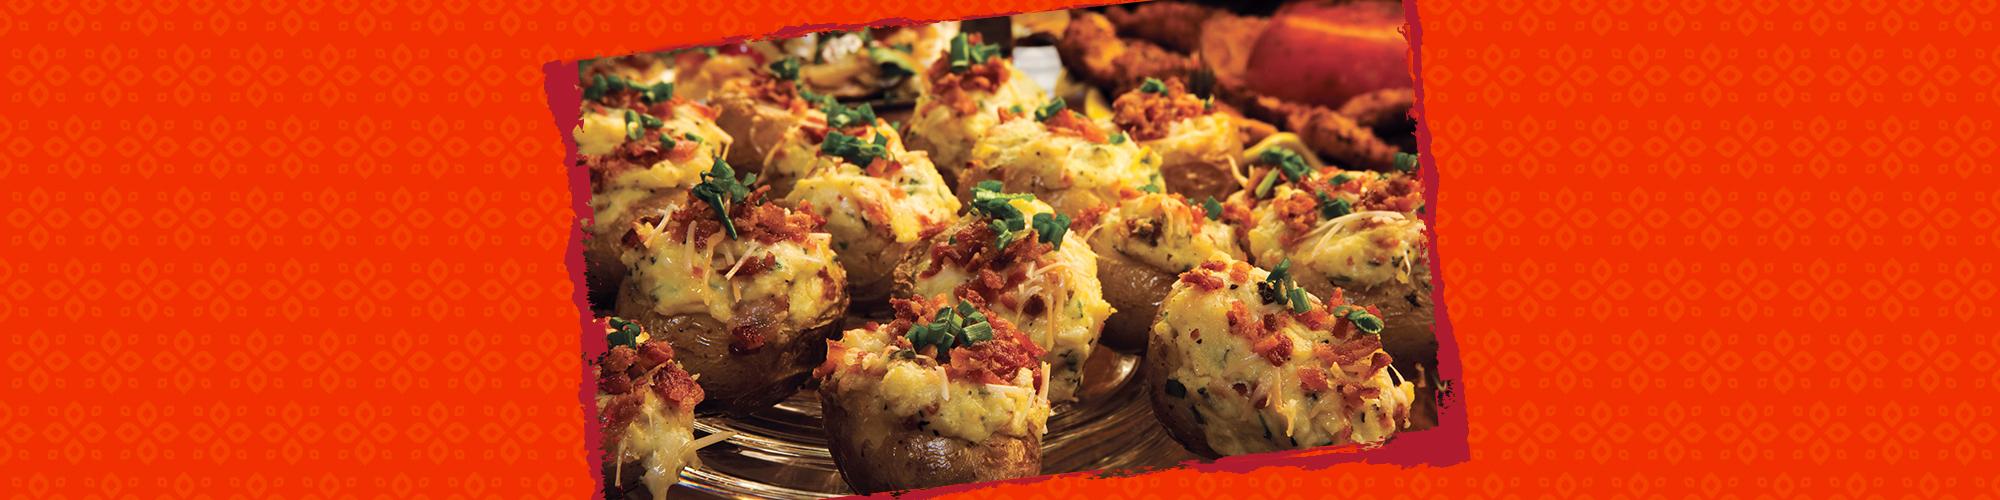 Salsas twice baked potatoes